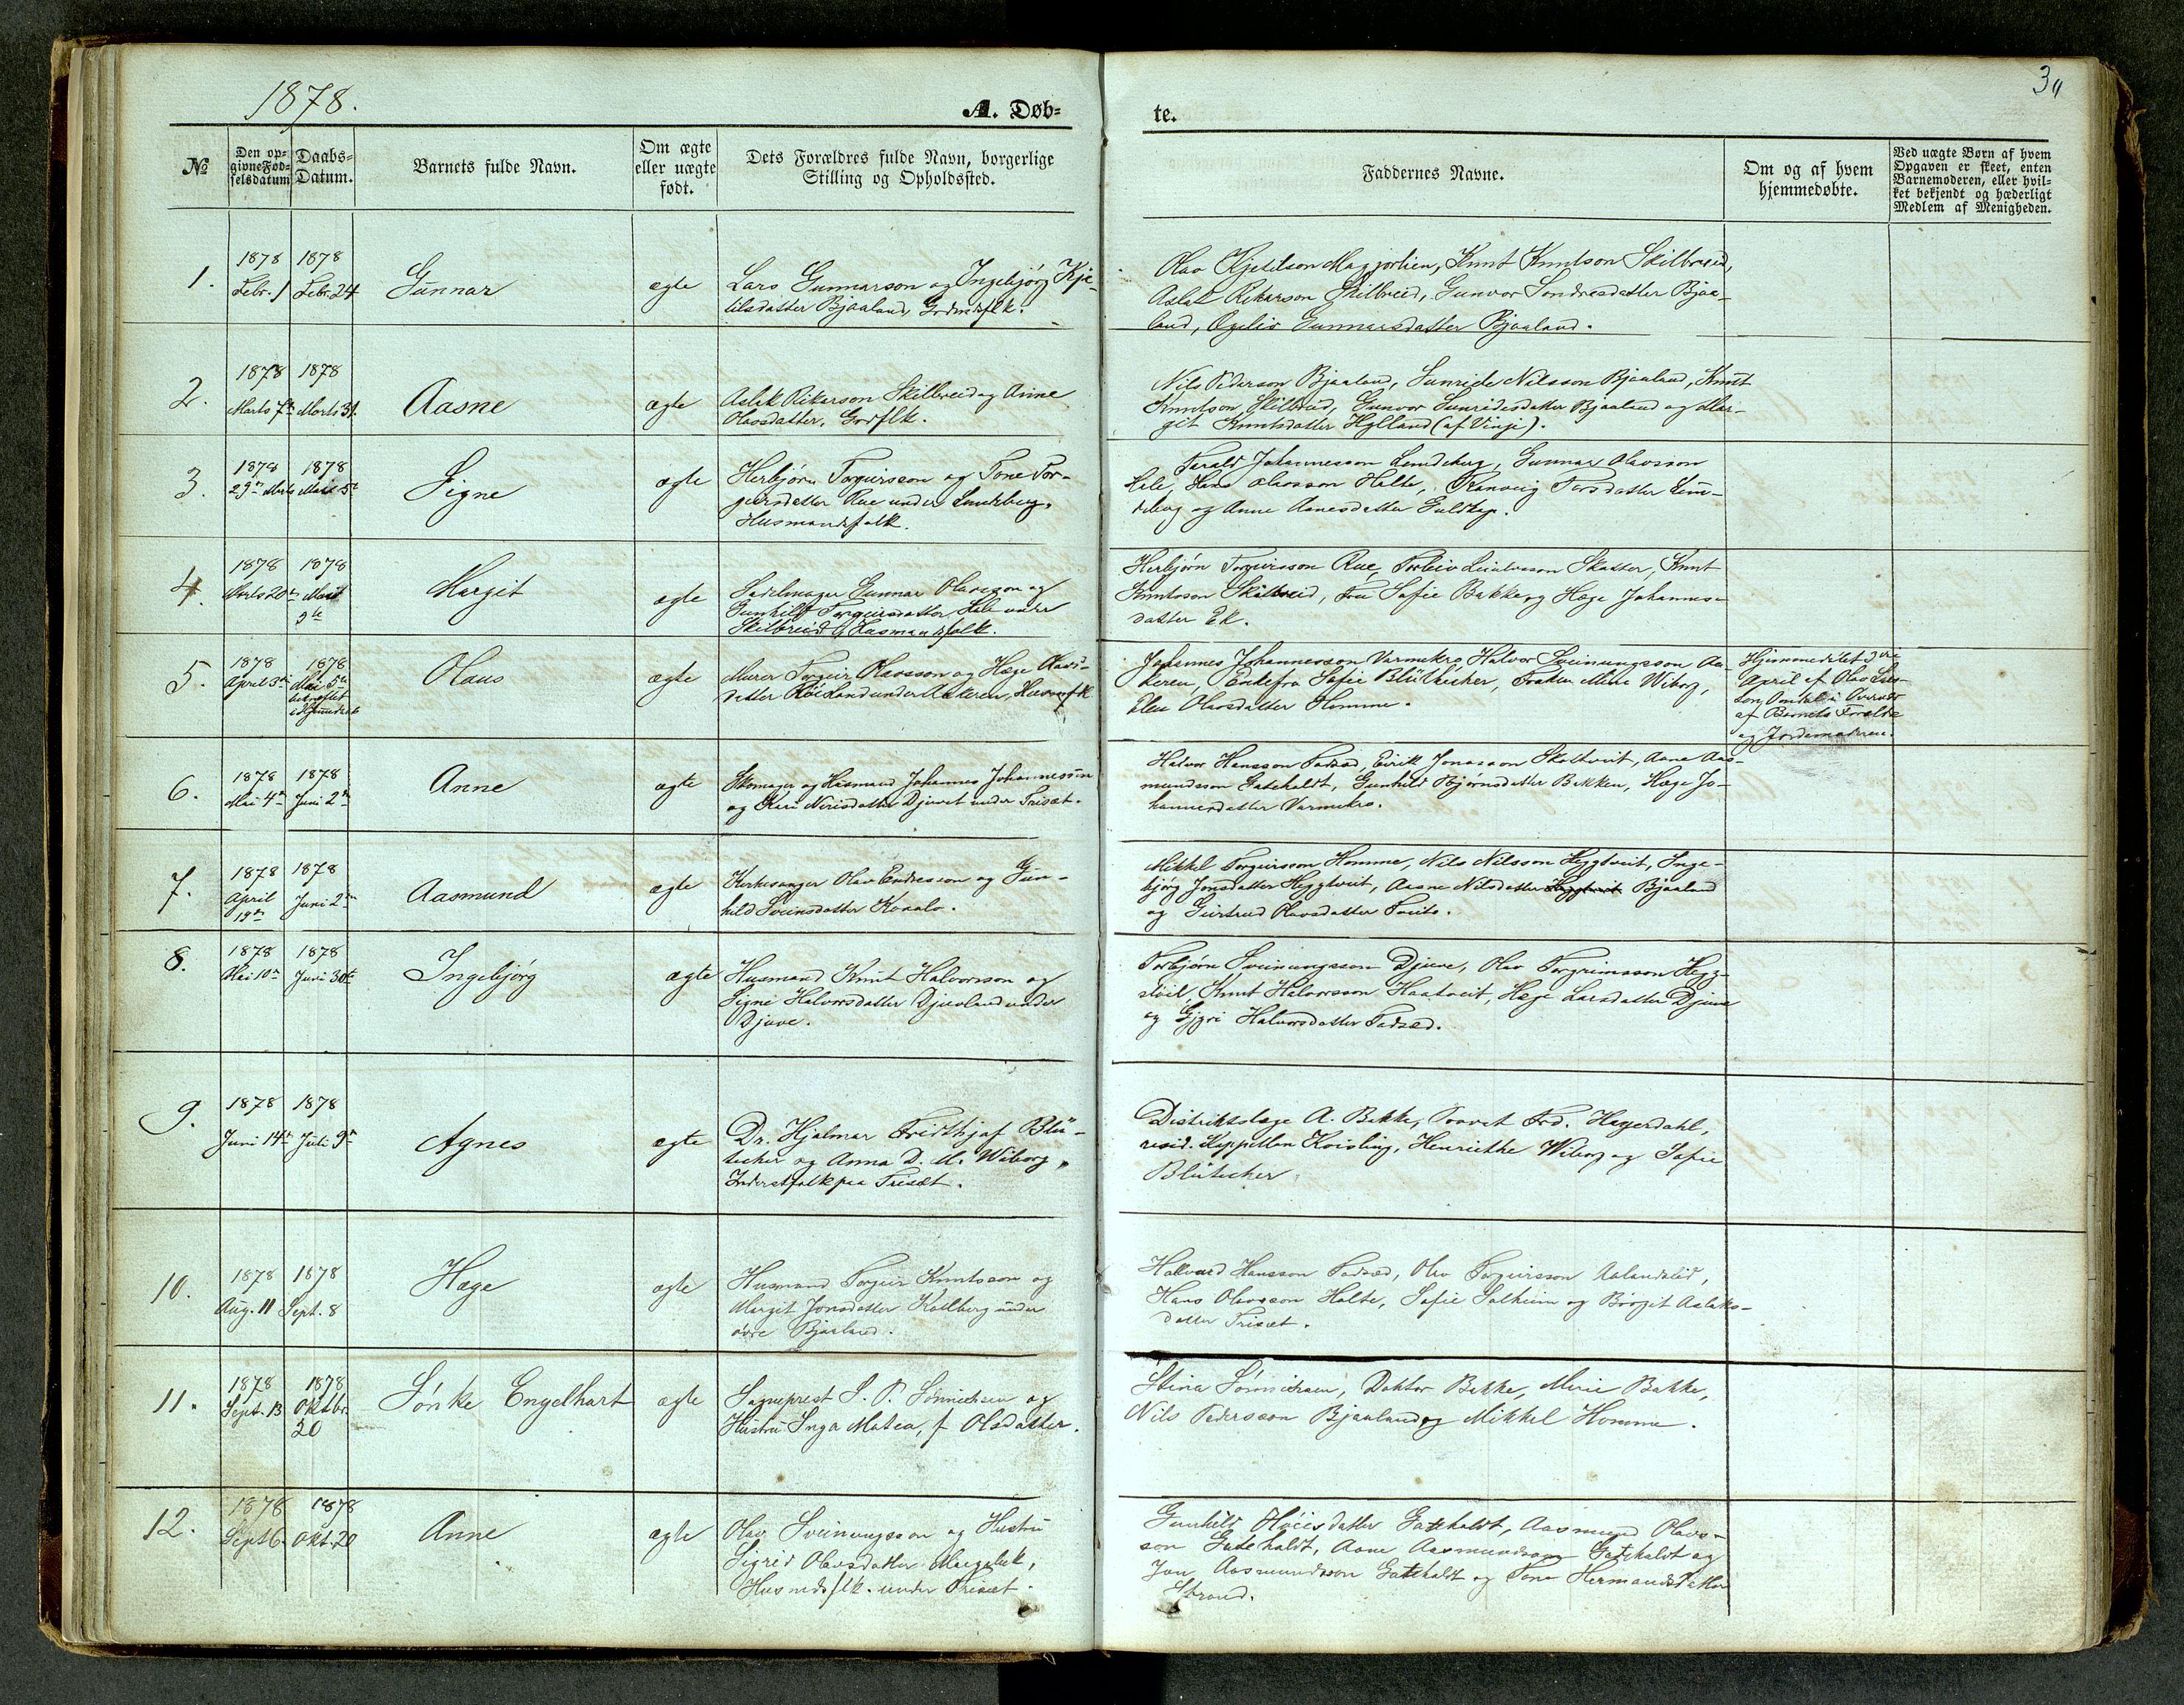 SAKO, Lårdal kirkebøker, G/Ga/L0002: Klokkerbok nr. I 2, 1861-1890, s. 30